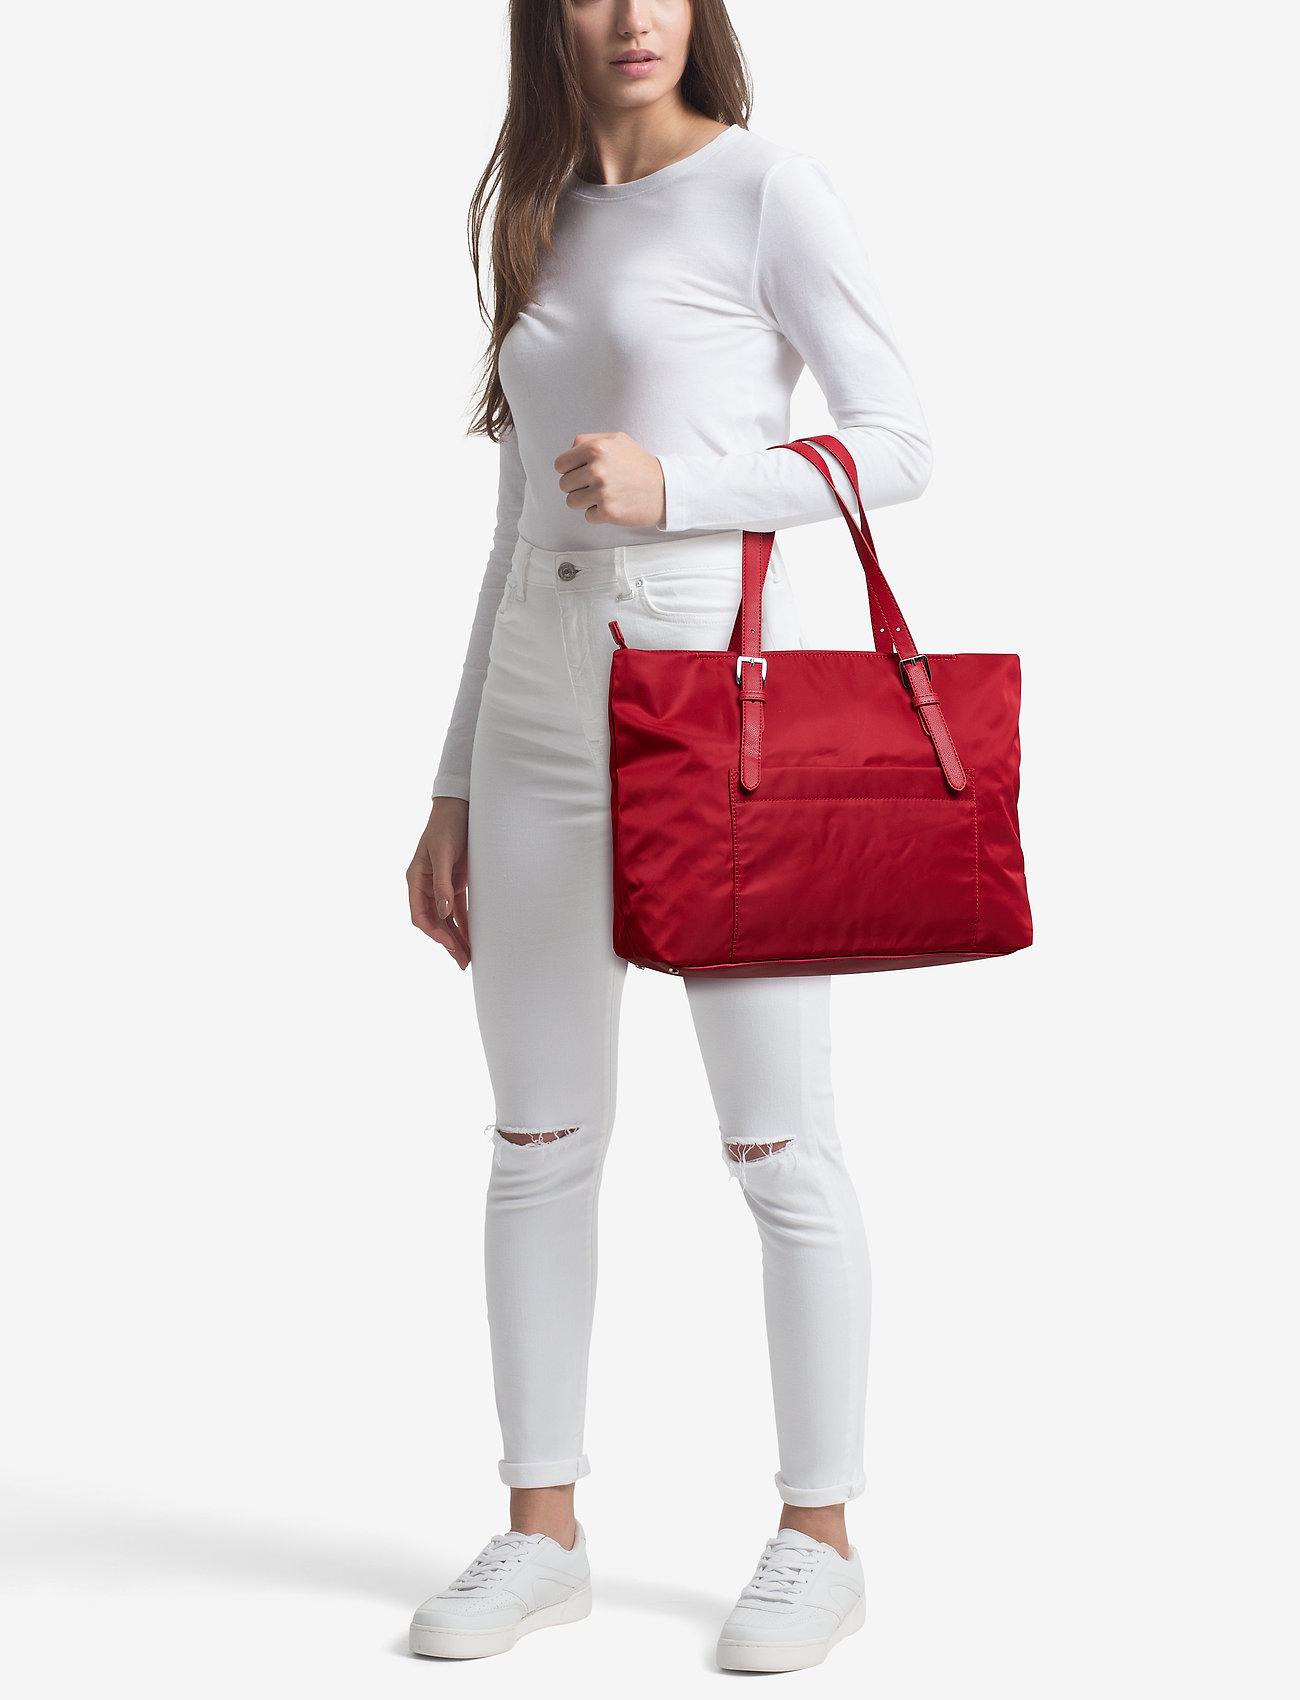 Samsonite Karissa Shopping Bag M - FORMULA RED